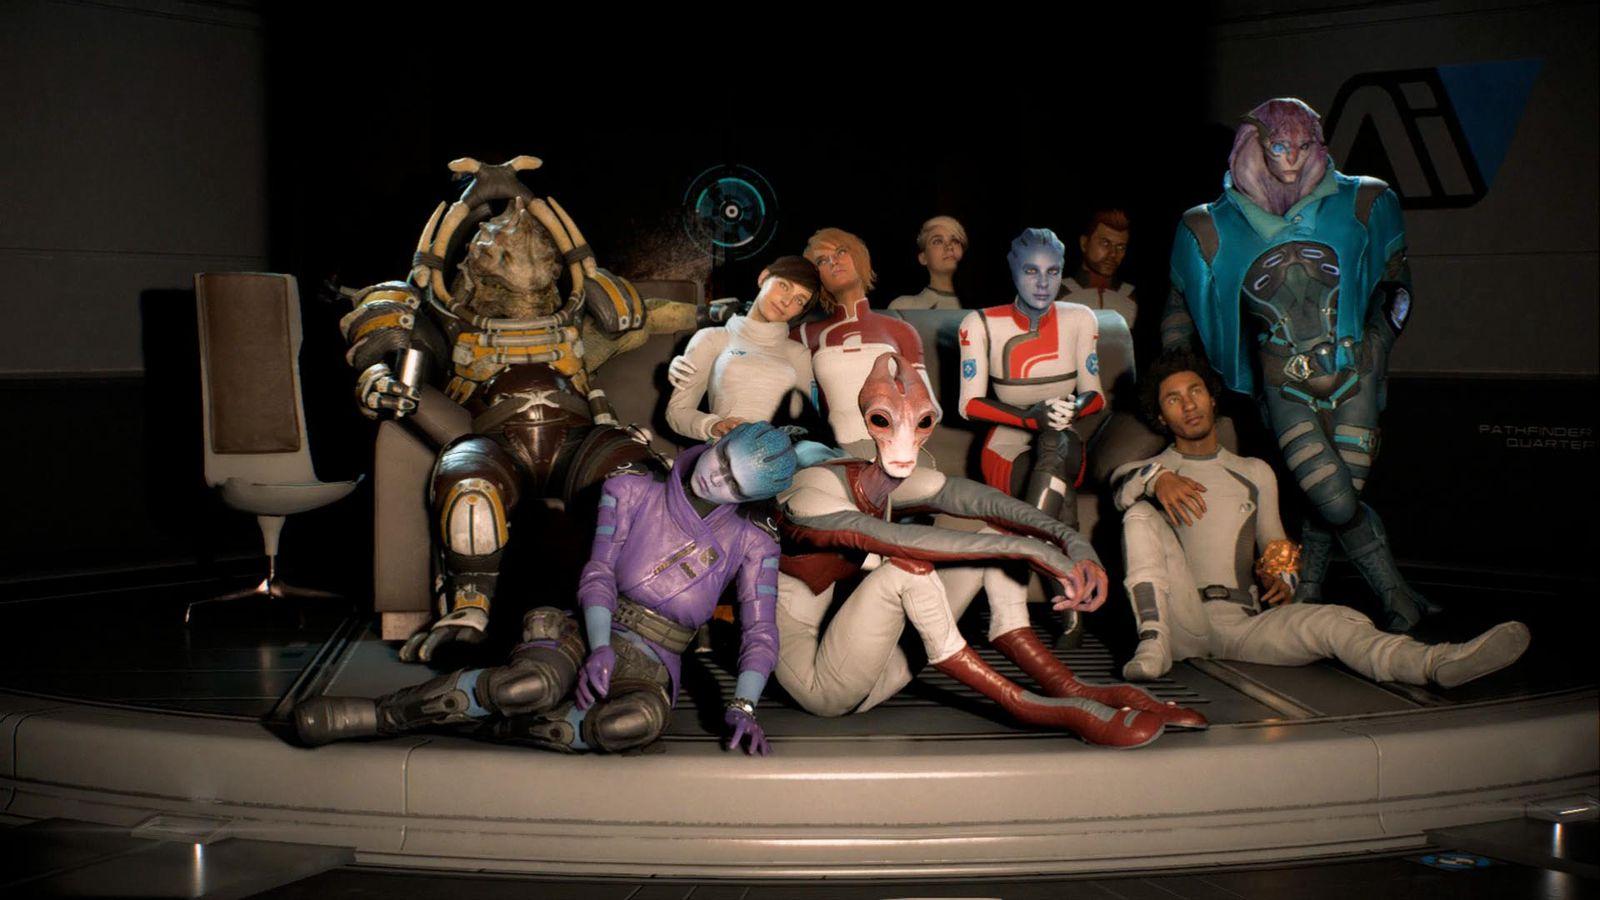 Mass Effect Andromeda Drinks